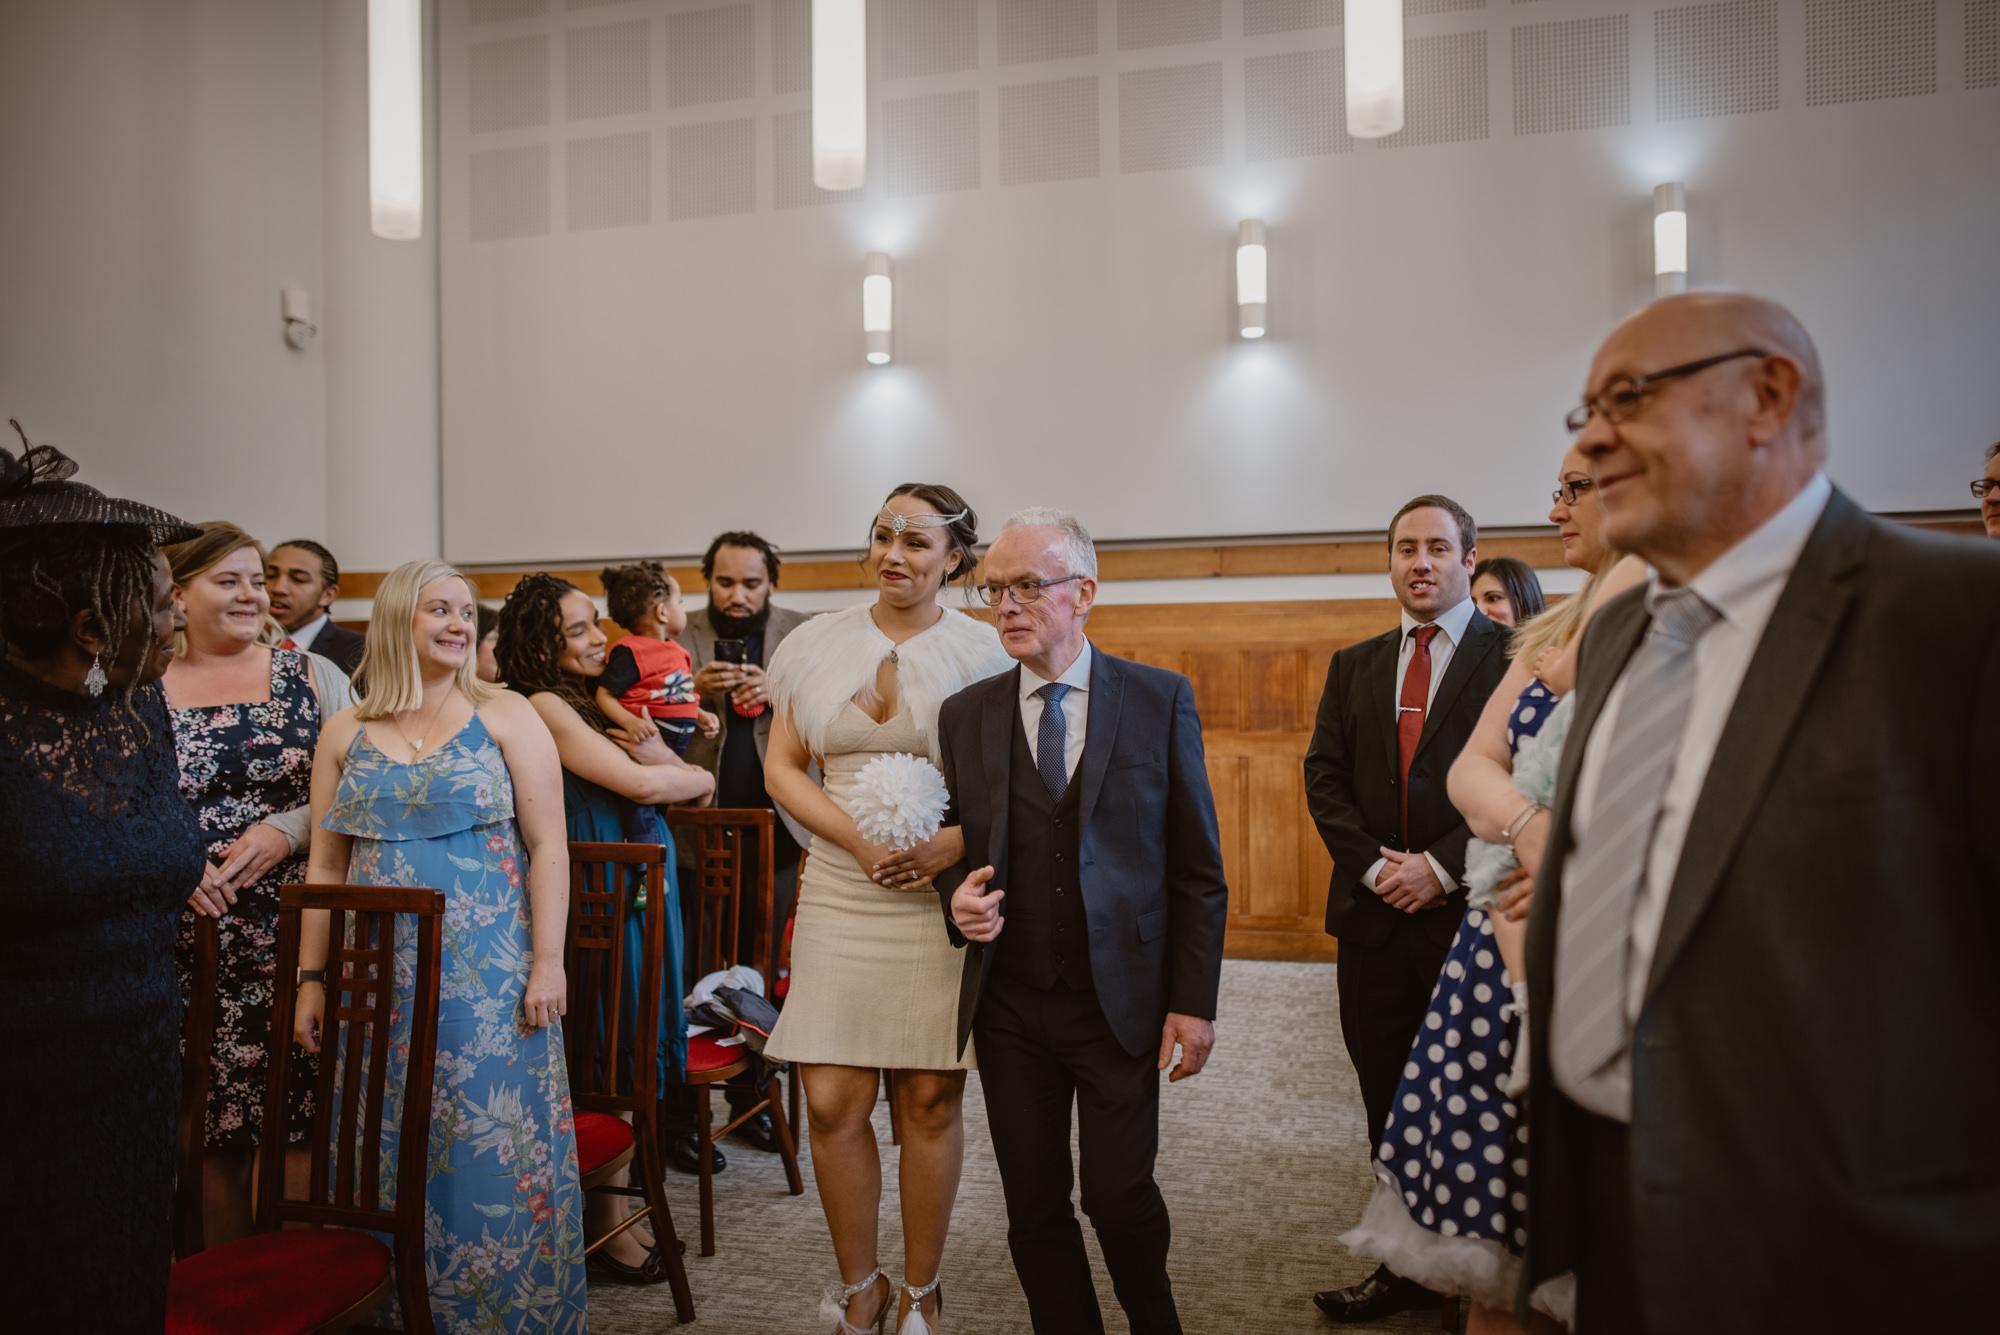 Jacqueline-Gareth-Wedding-Westmead-Events-Surrey-Manu-Mendoza-Wedding-Photography-037.jpg